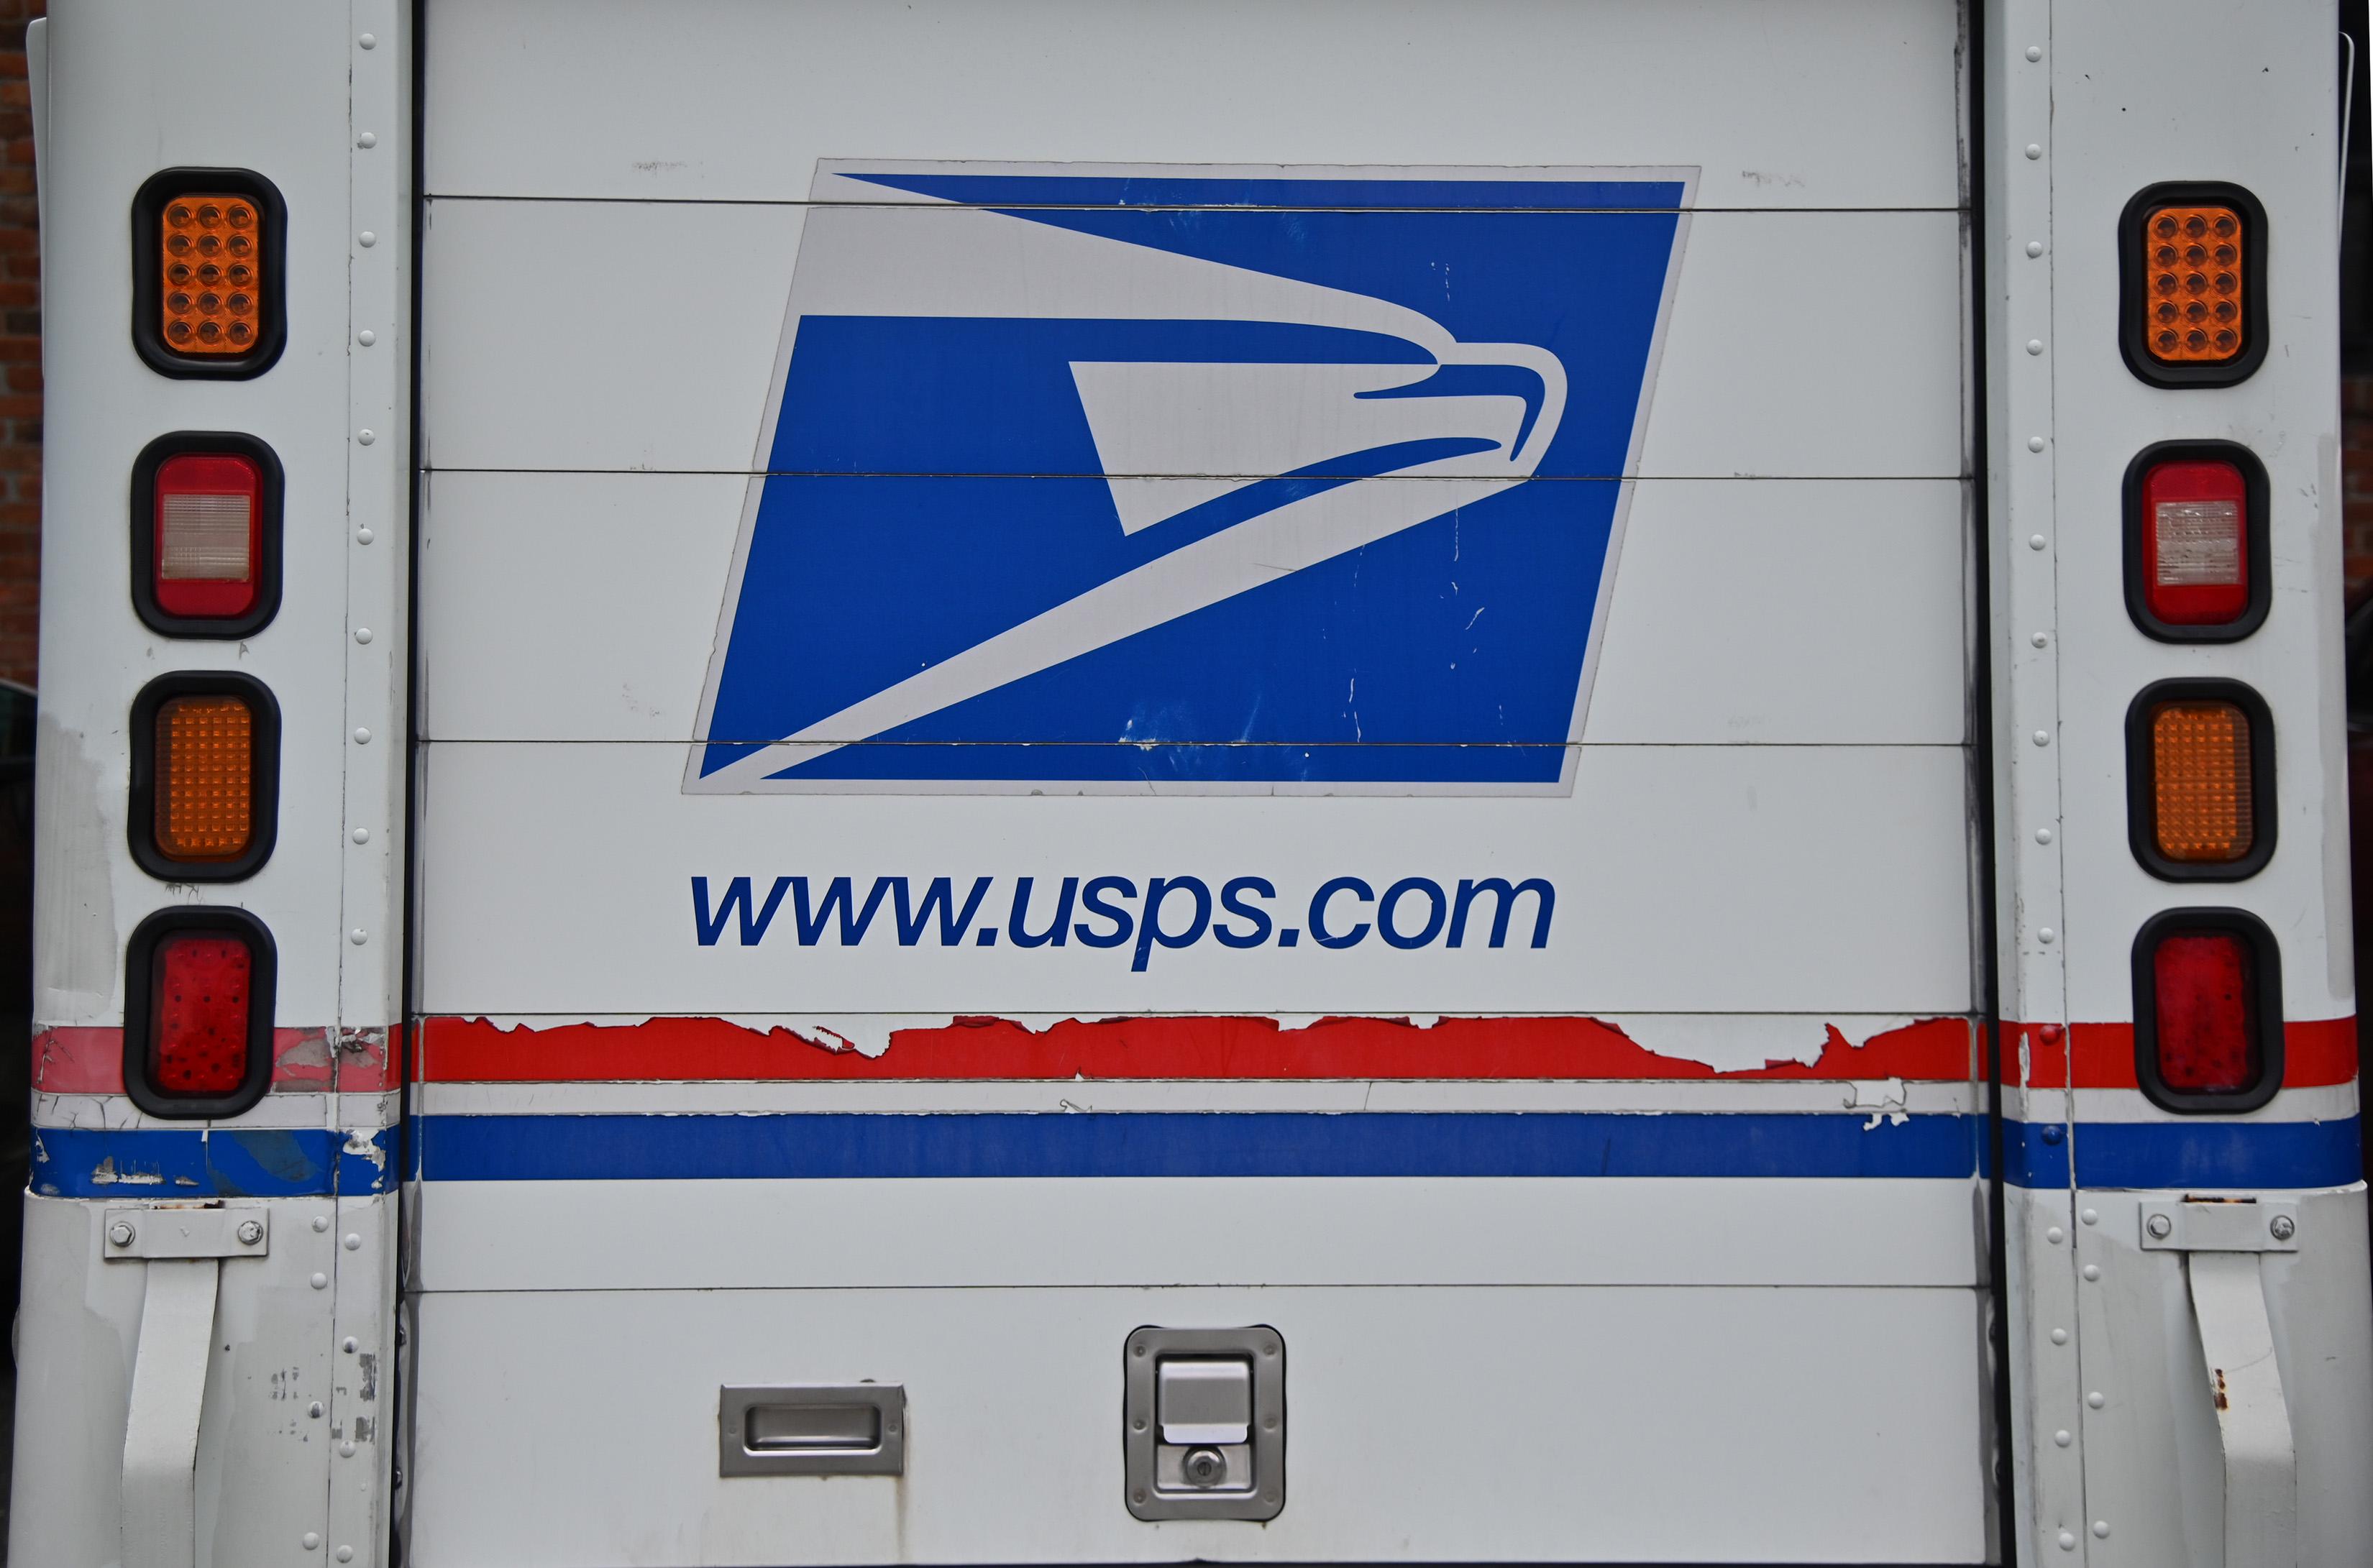 A U.S. Postal Service truck.